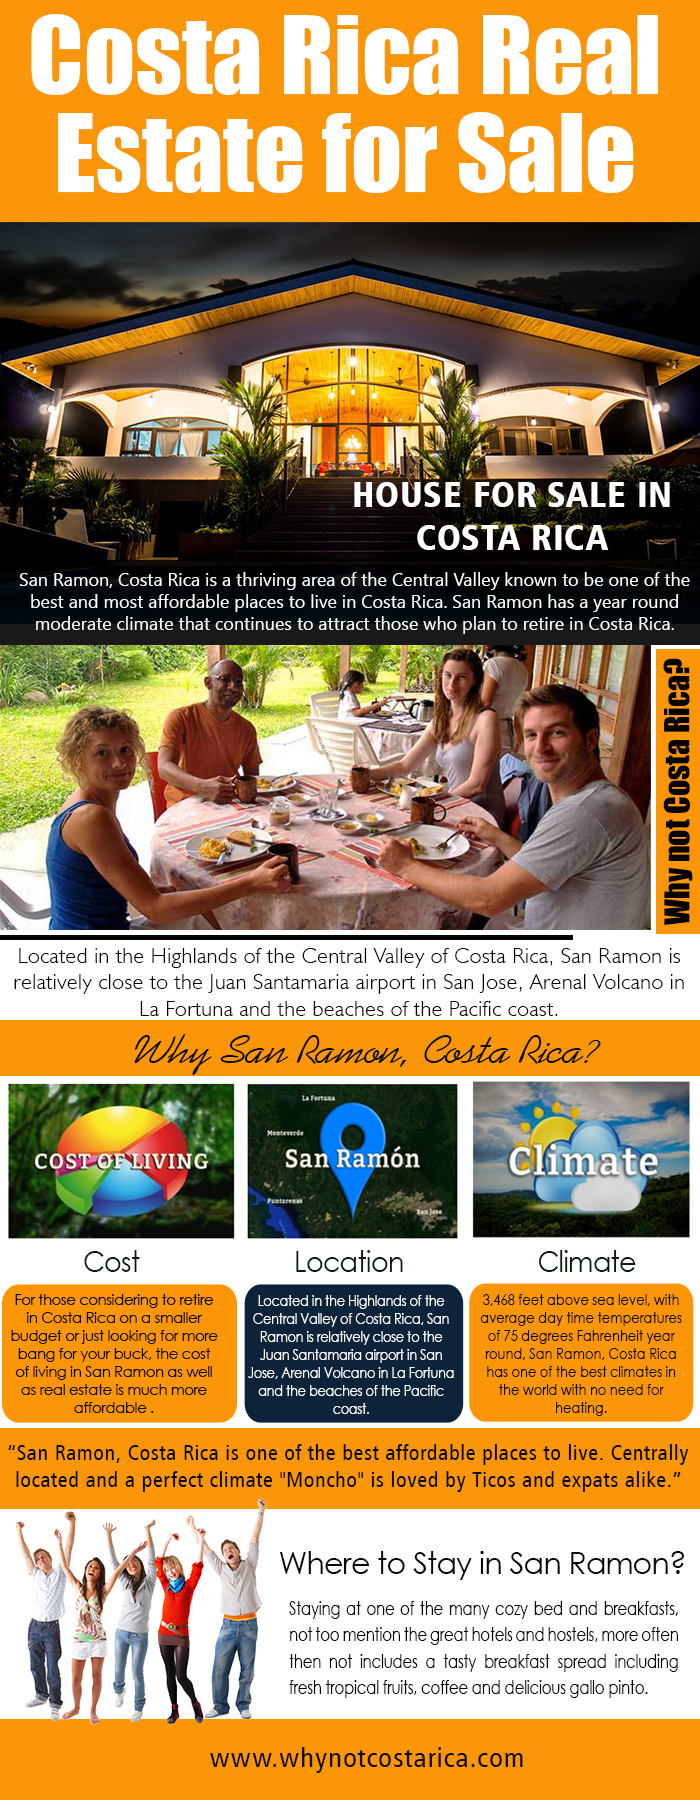 San Ramon Costa Rica Properties For Sale